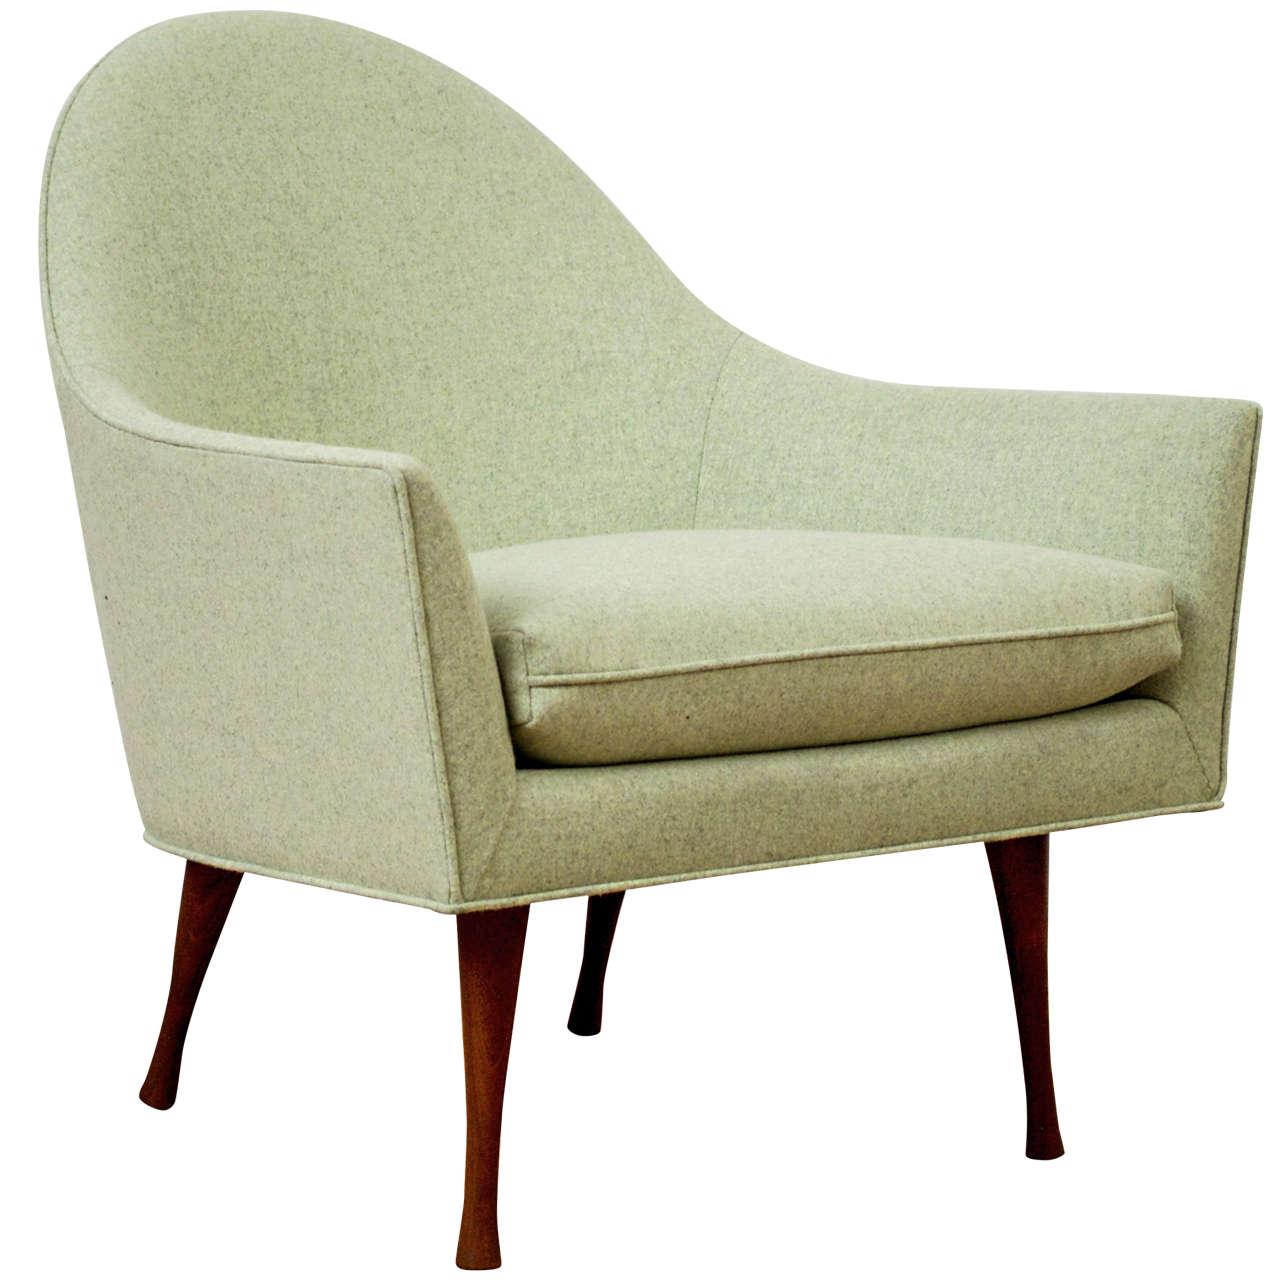 Paul McCobb for Widdi b Lounge Chair at 1stdibs